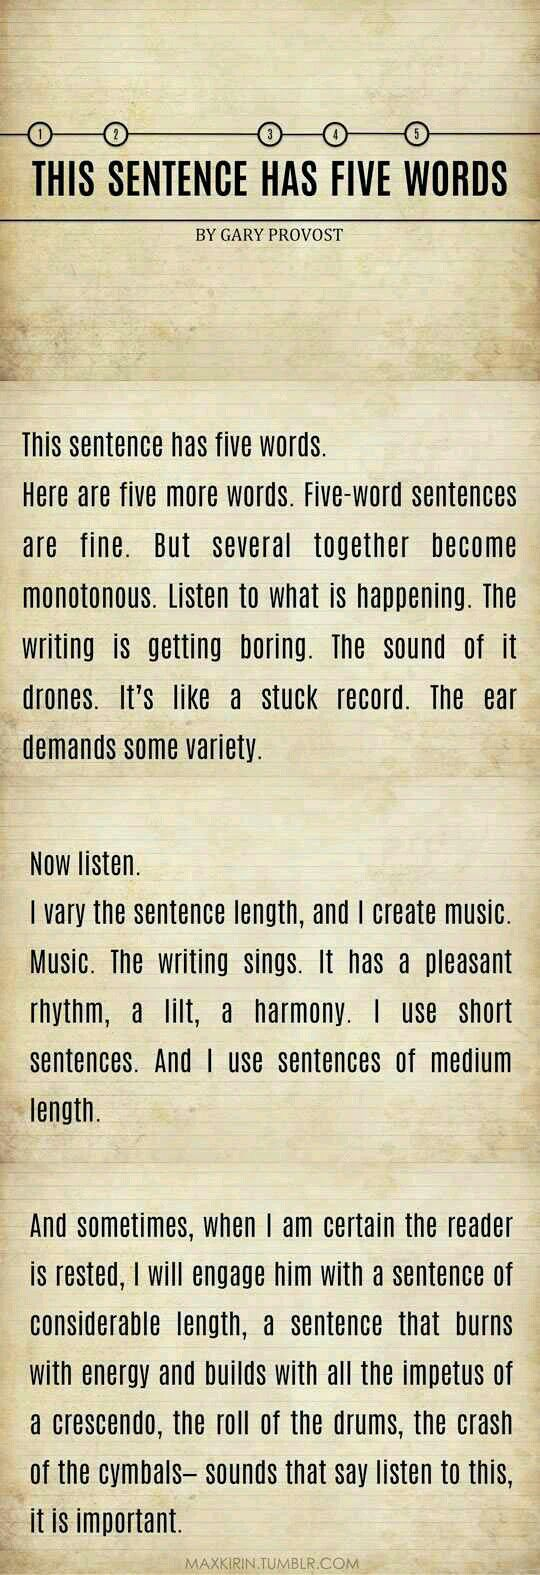 Random Writing Tips (Book 1) - Five Words Sentences? - Wattpad